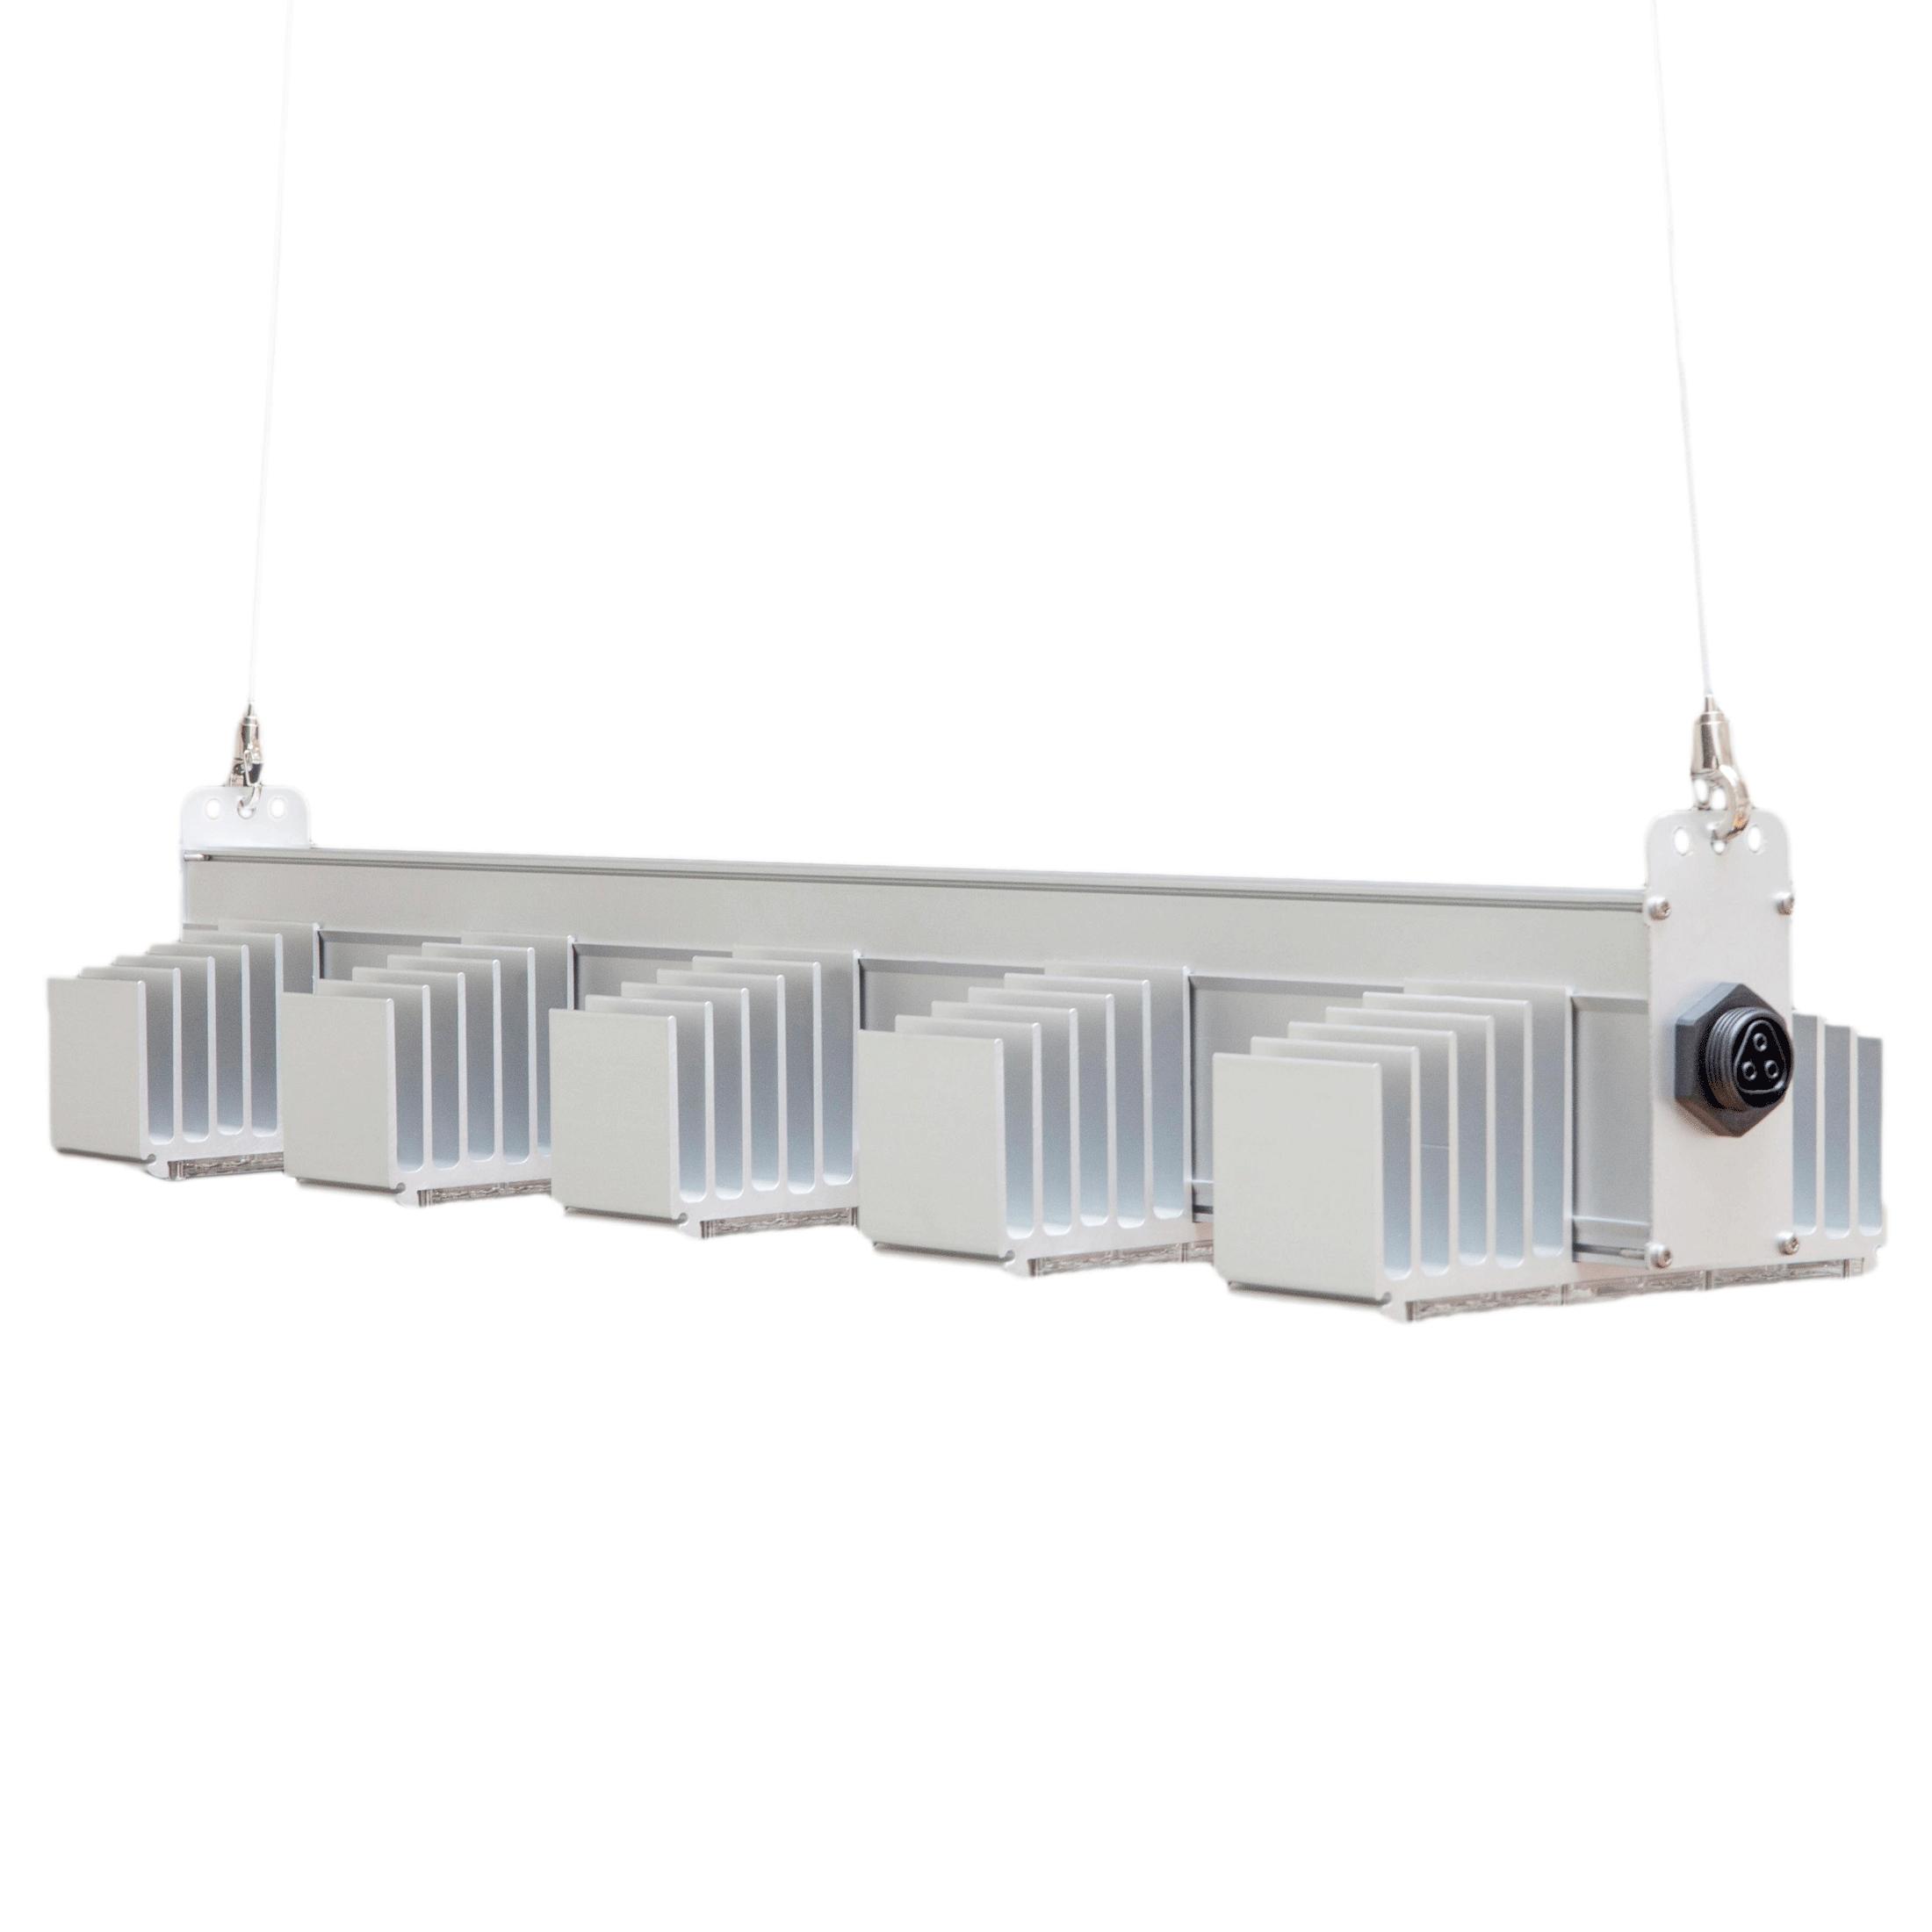 SANlight - Q6W LED 2. Generation (inkl. Kabel + Dimmer)